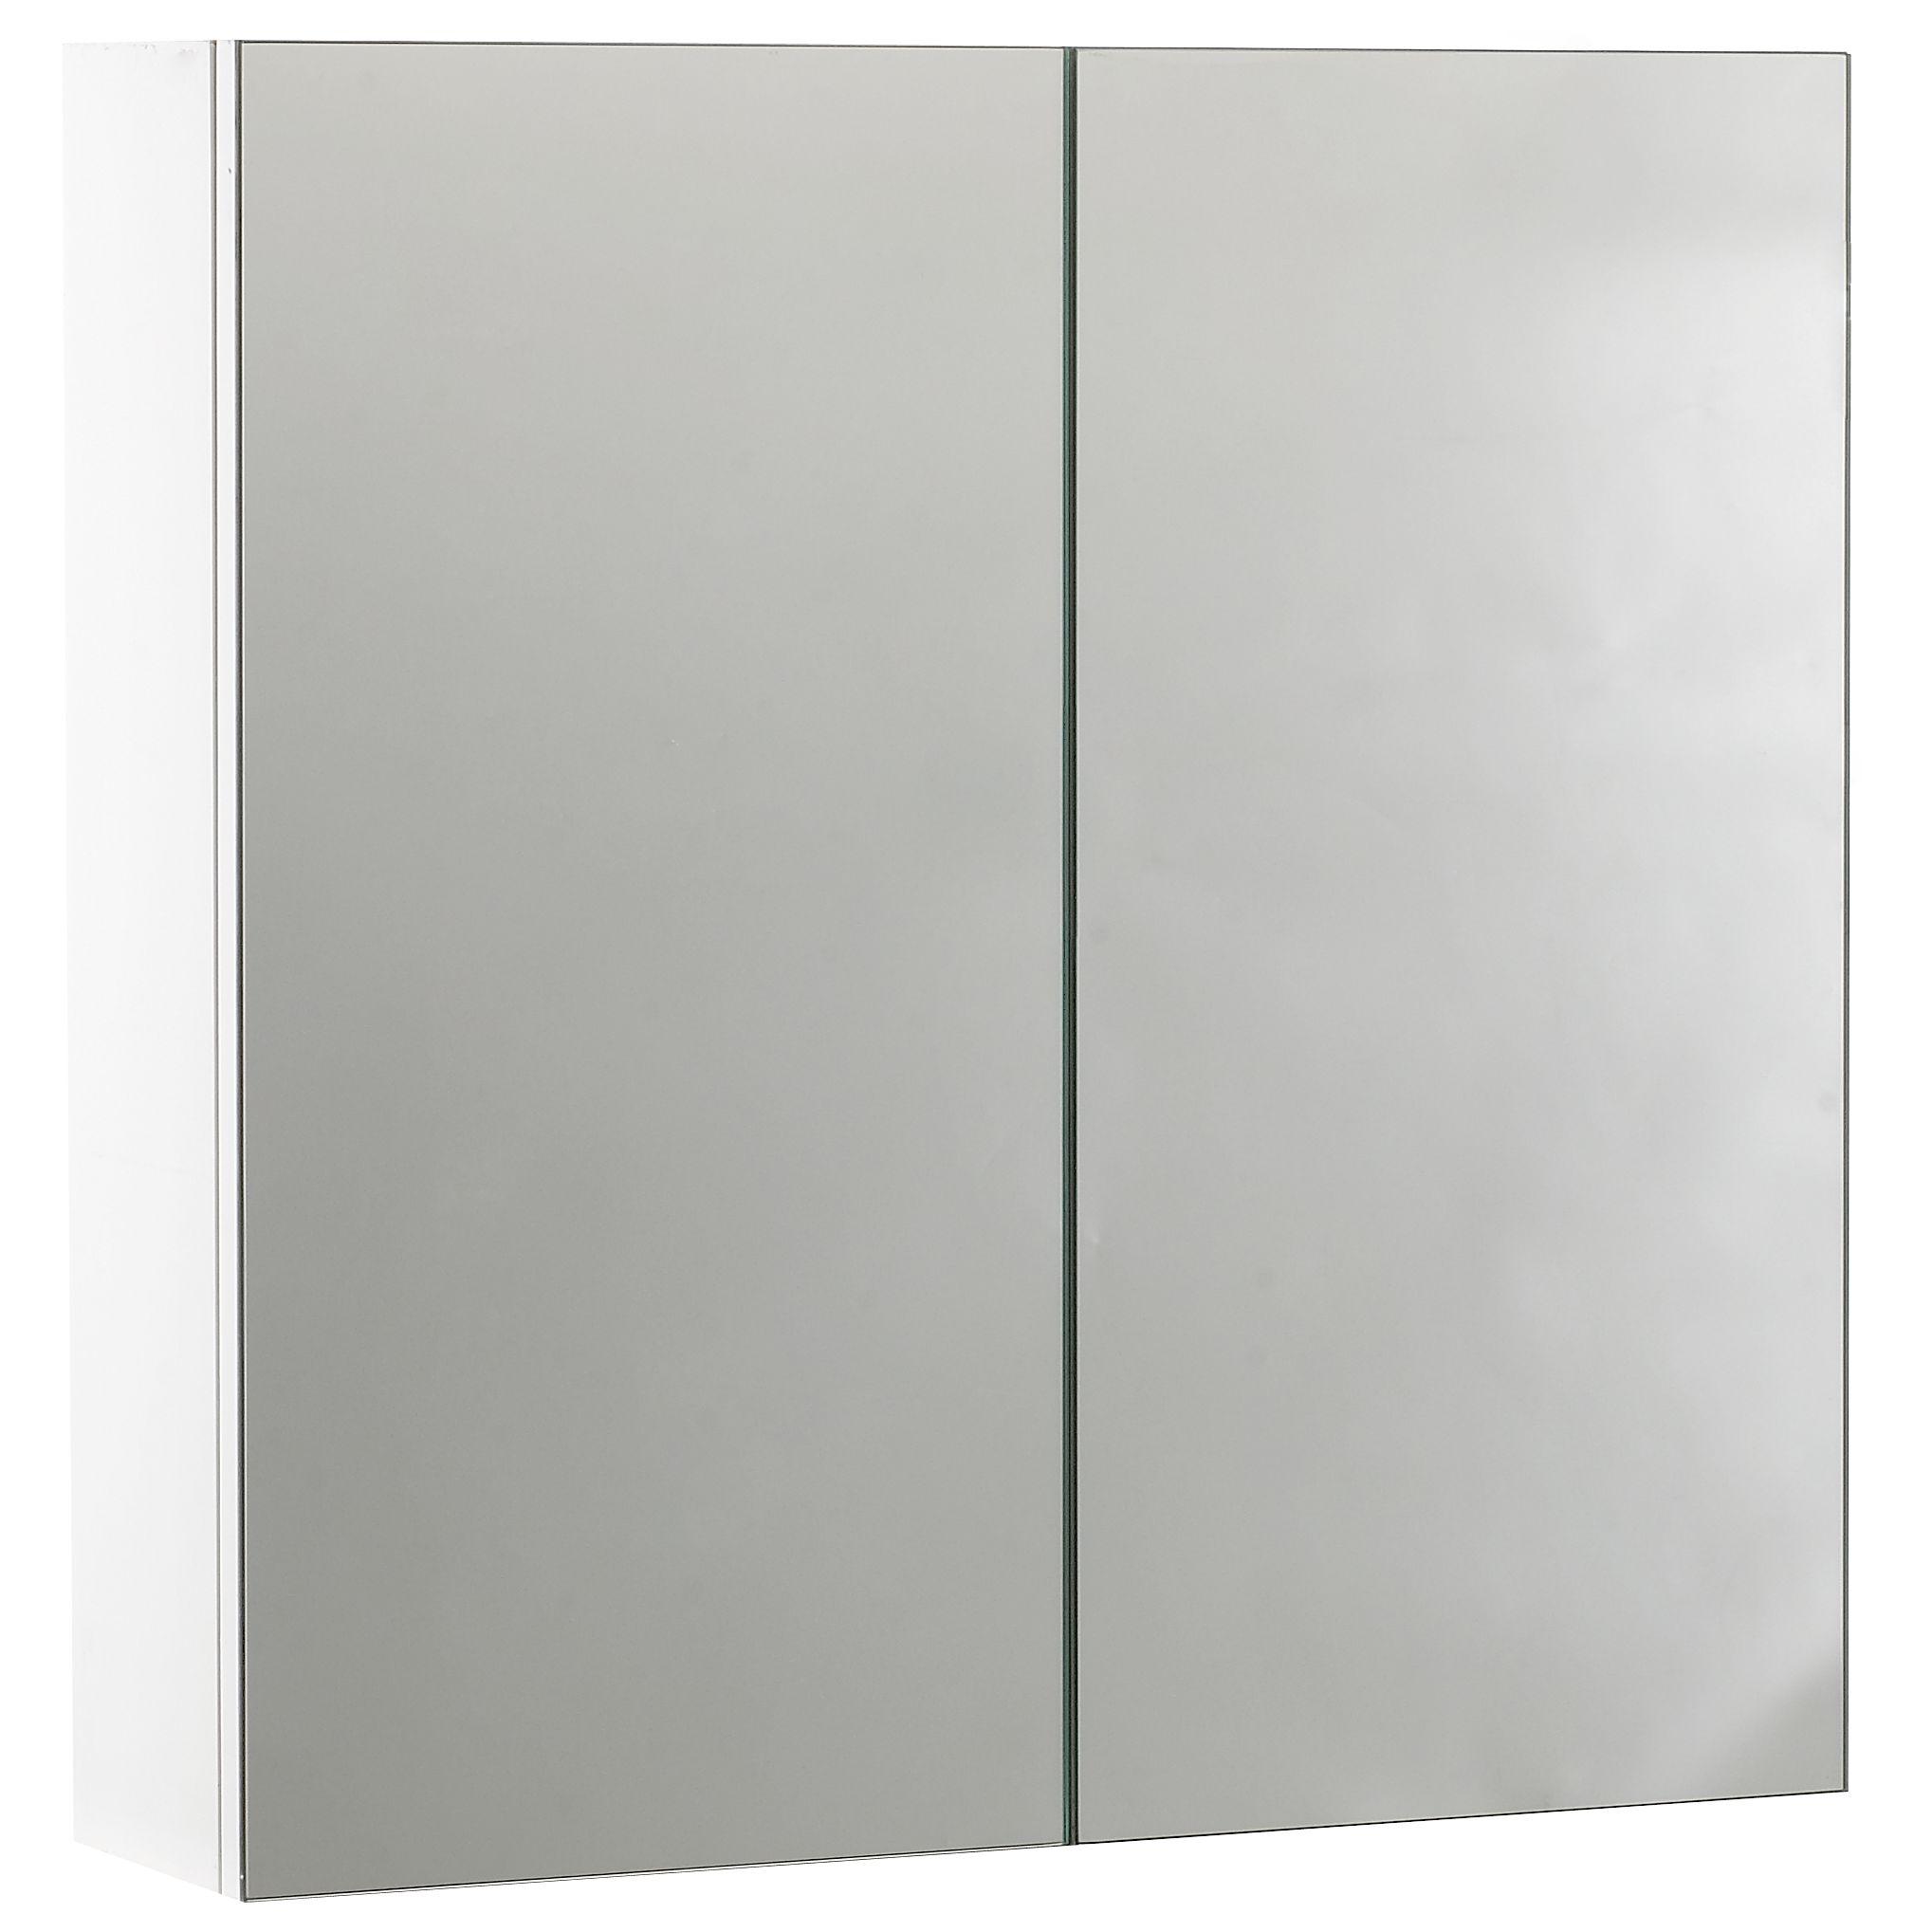 John Lewis Double Door Bathroom Cabinet, White at John Lewis